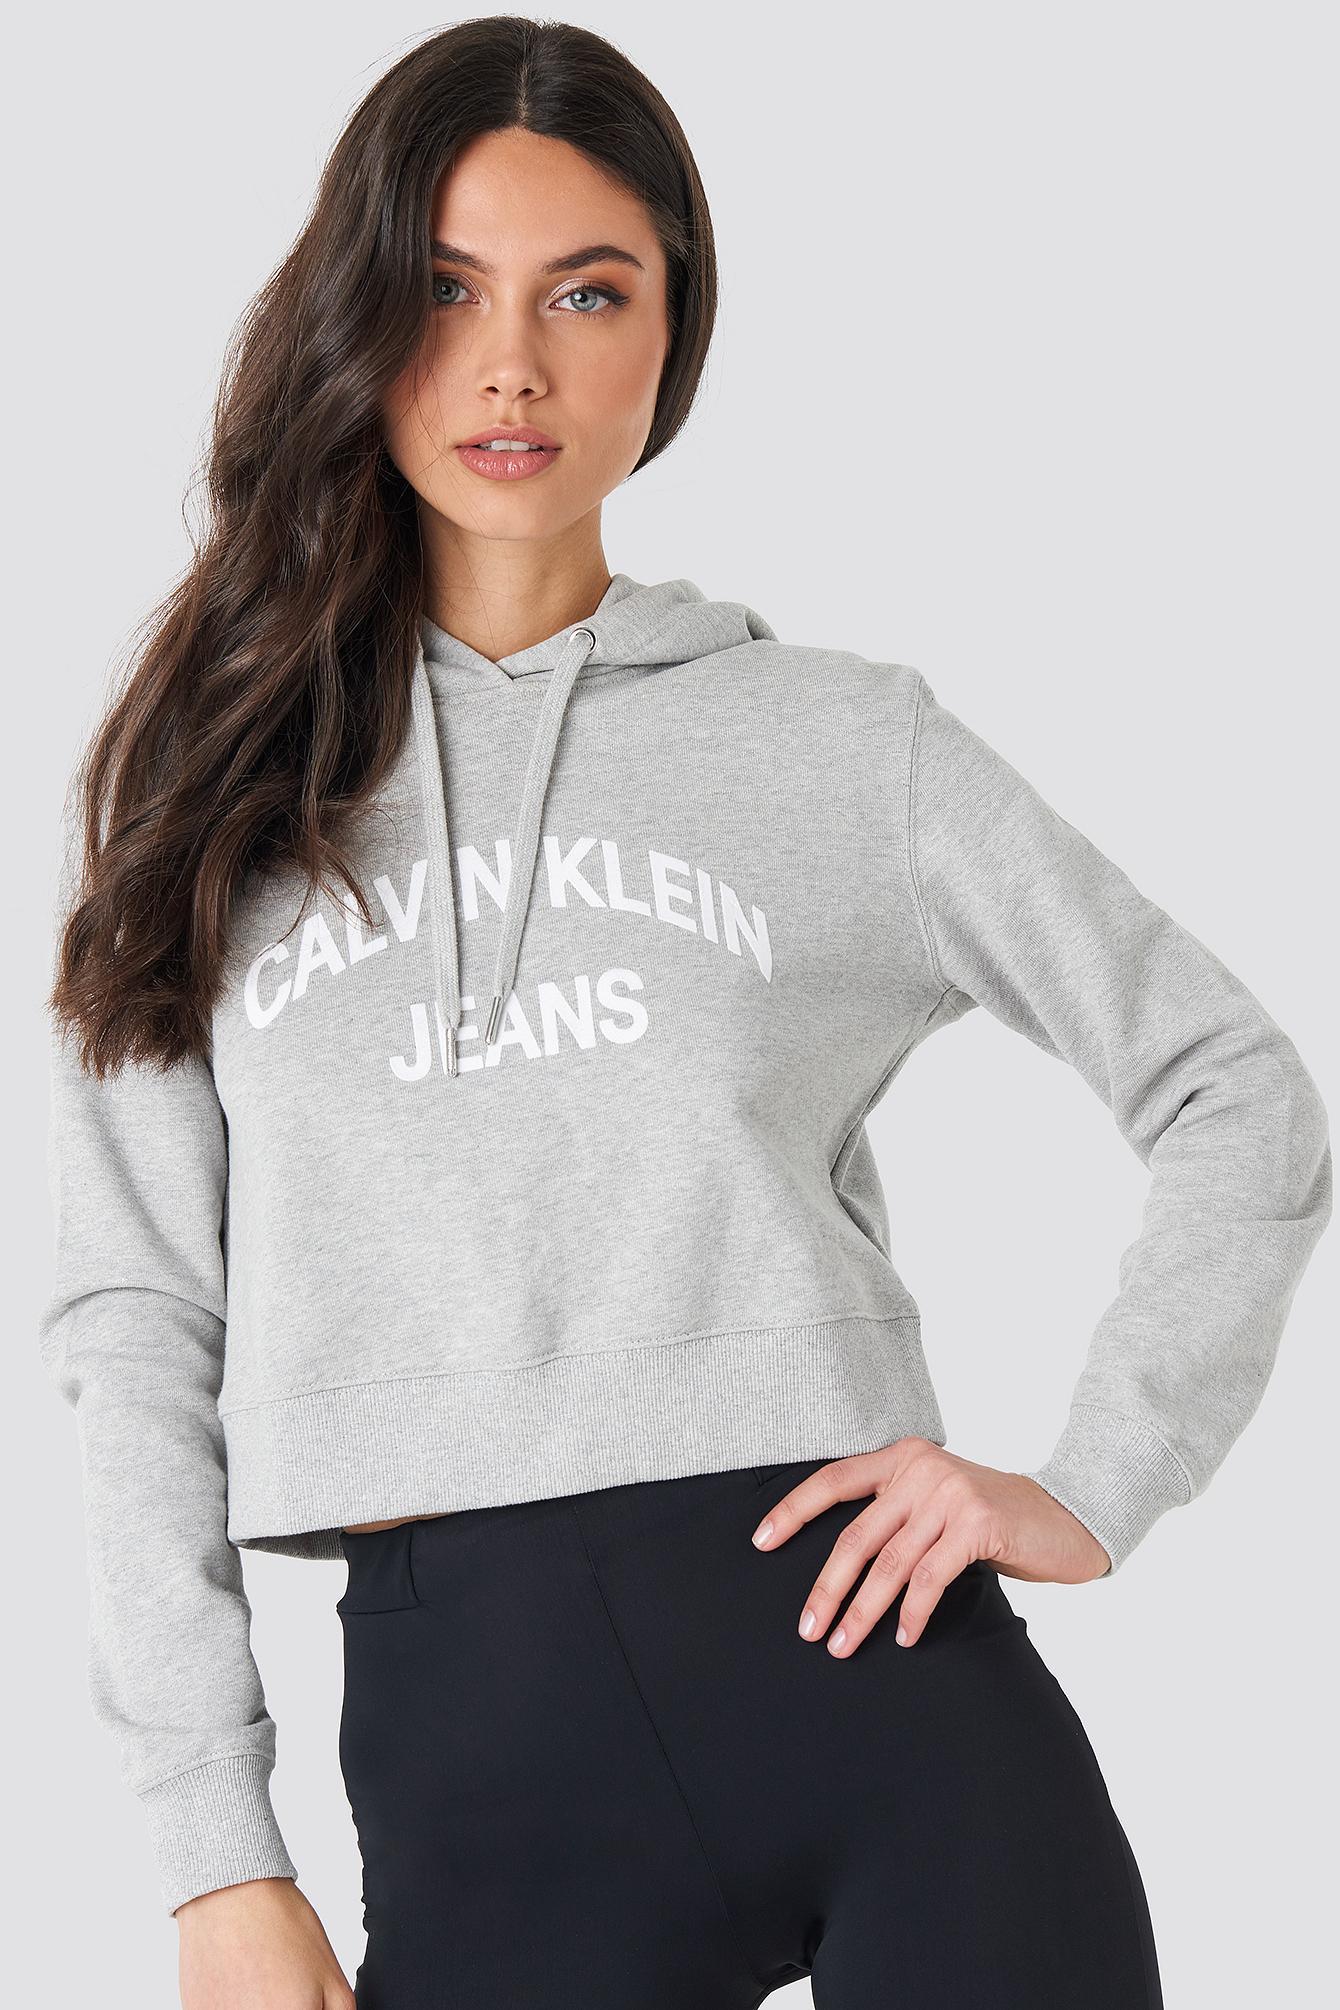 87fafe779ef2f Lyst - Calvin Klein Curved Logo Crop Hoodie Light Grey Heather in Gray